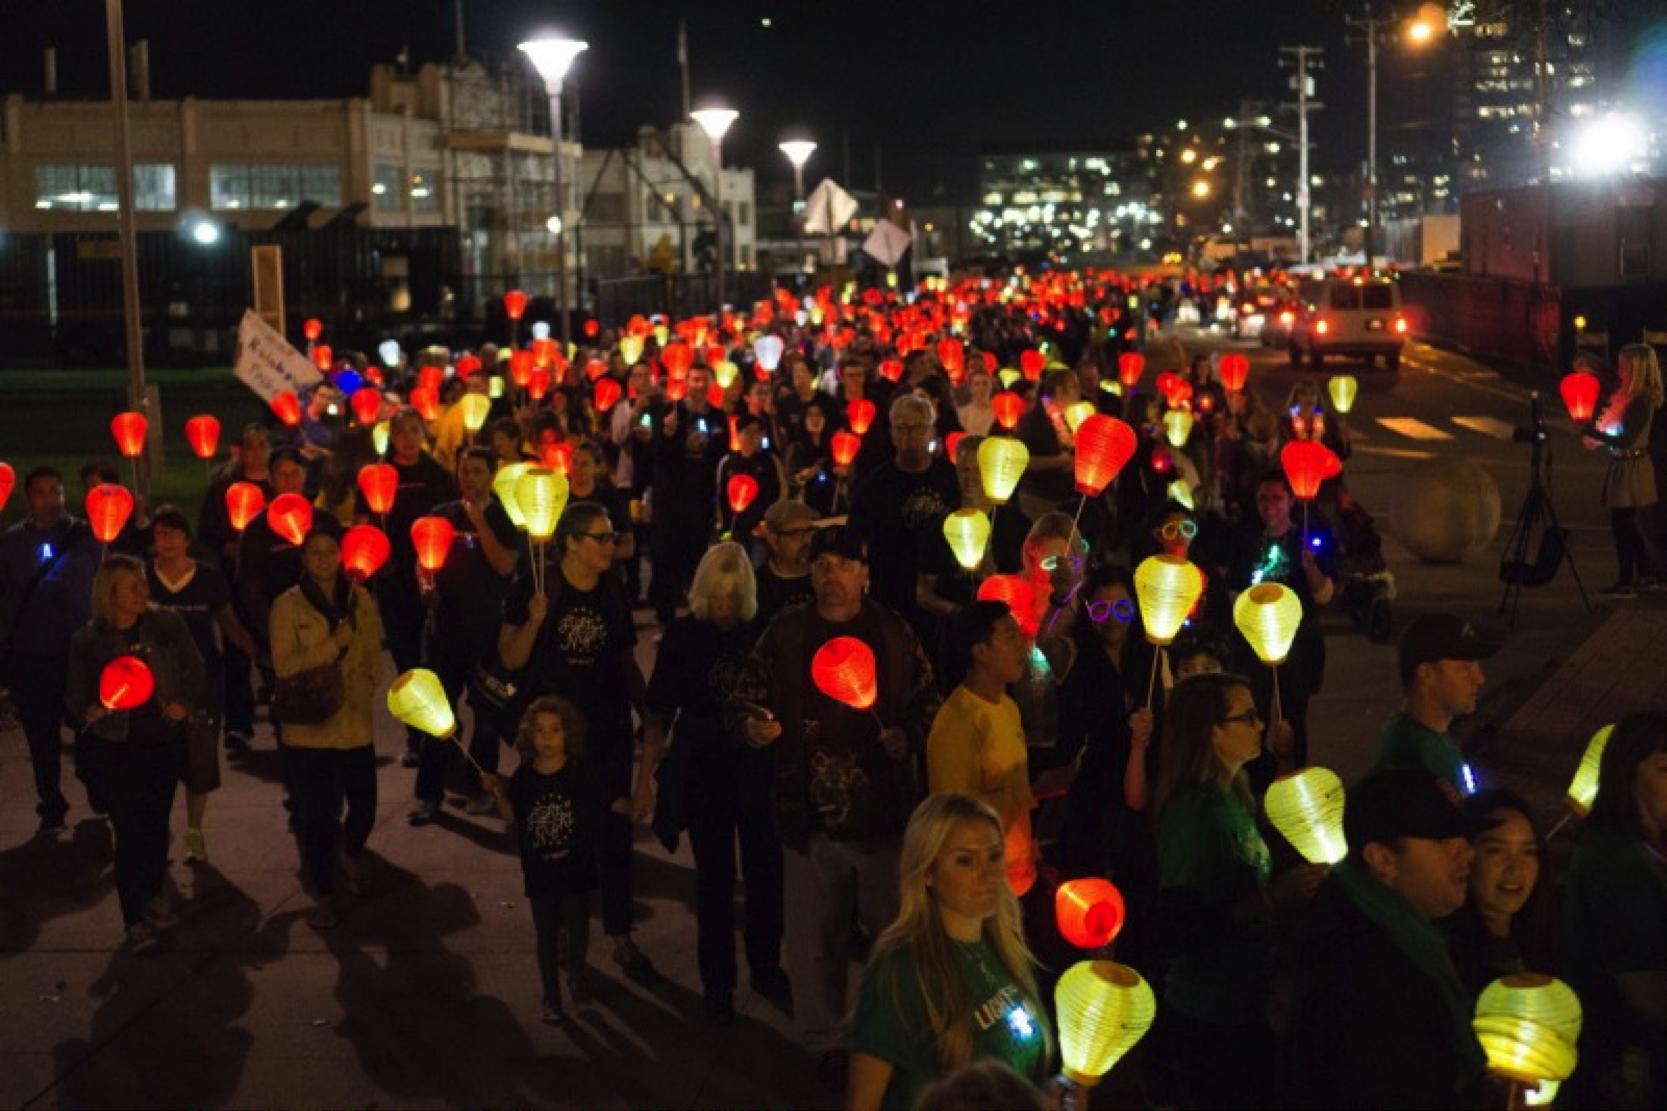 Salesforce Raises Over $2 Million for Light the Night!